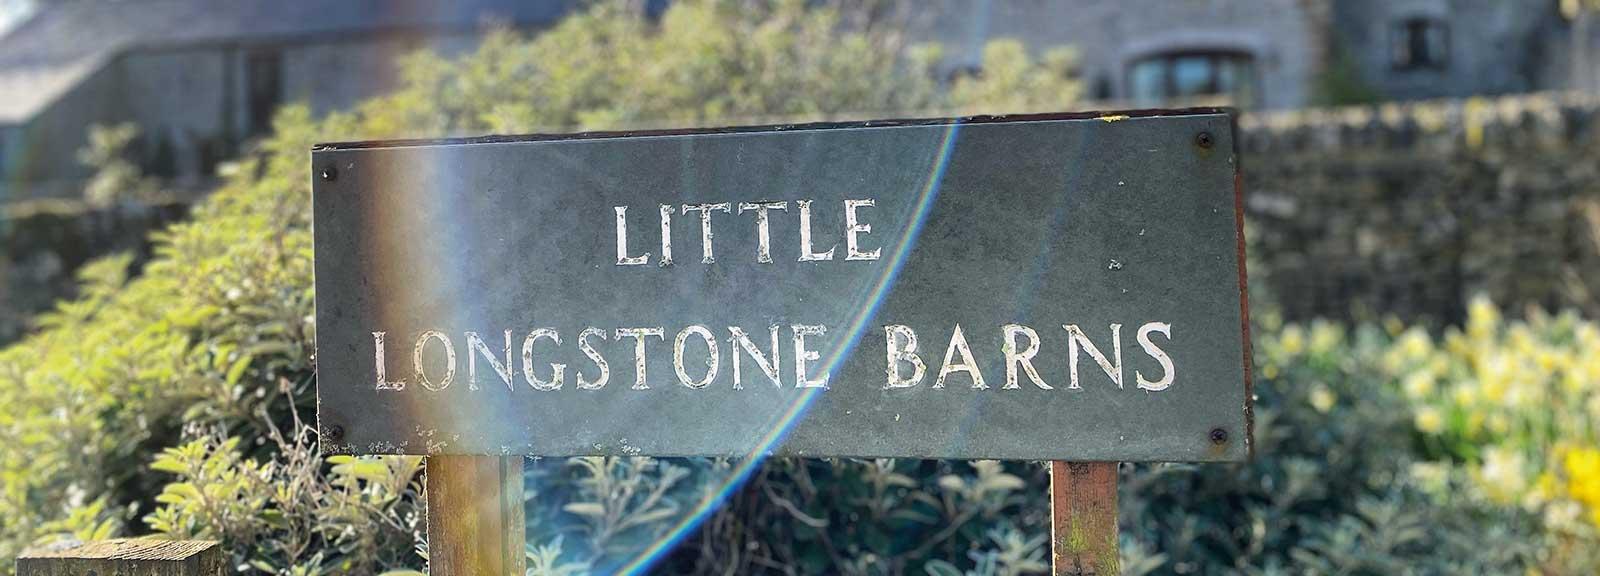 Little Longstone Barns